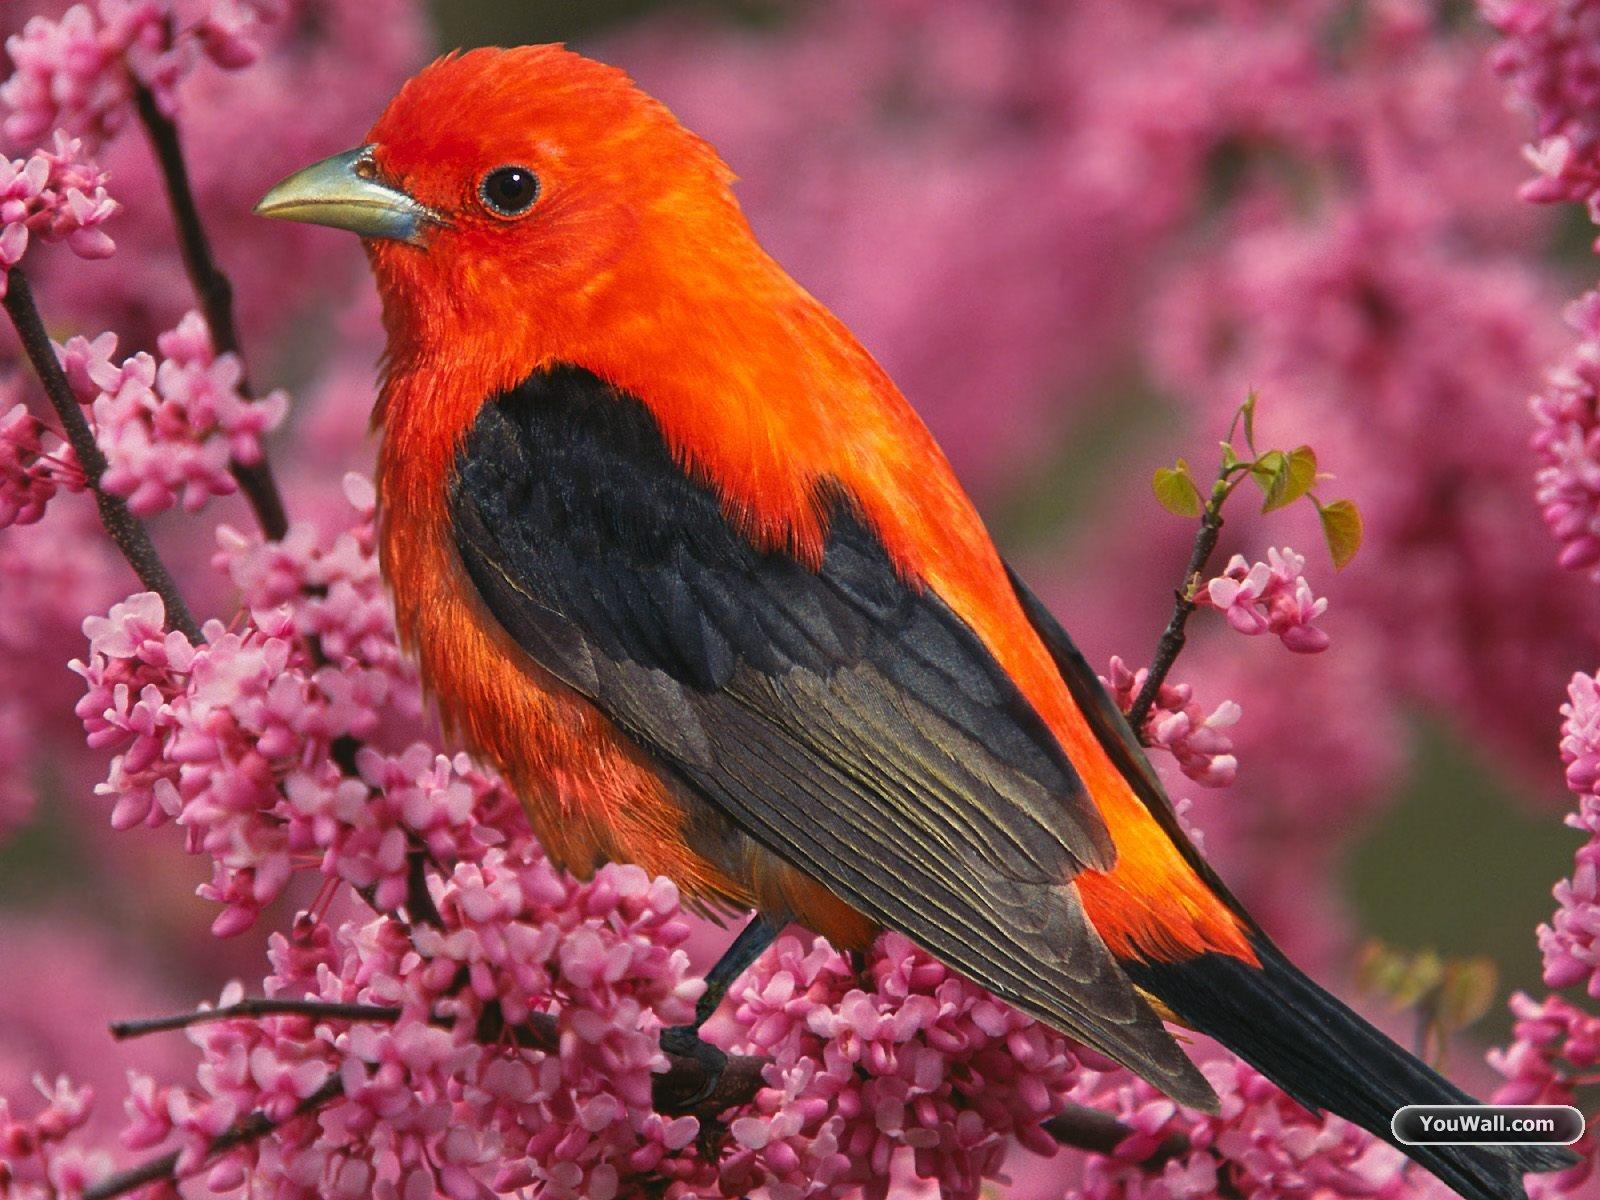 Wallpaper Gallery Love Bird Wallpaper: Beautifull Birds Wallpapers